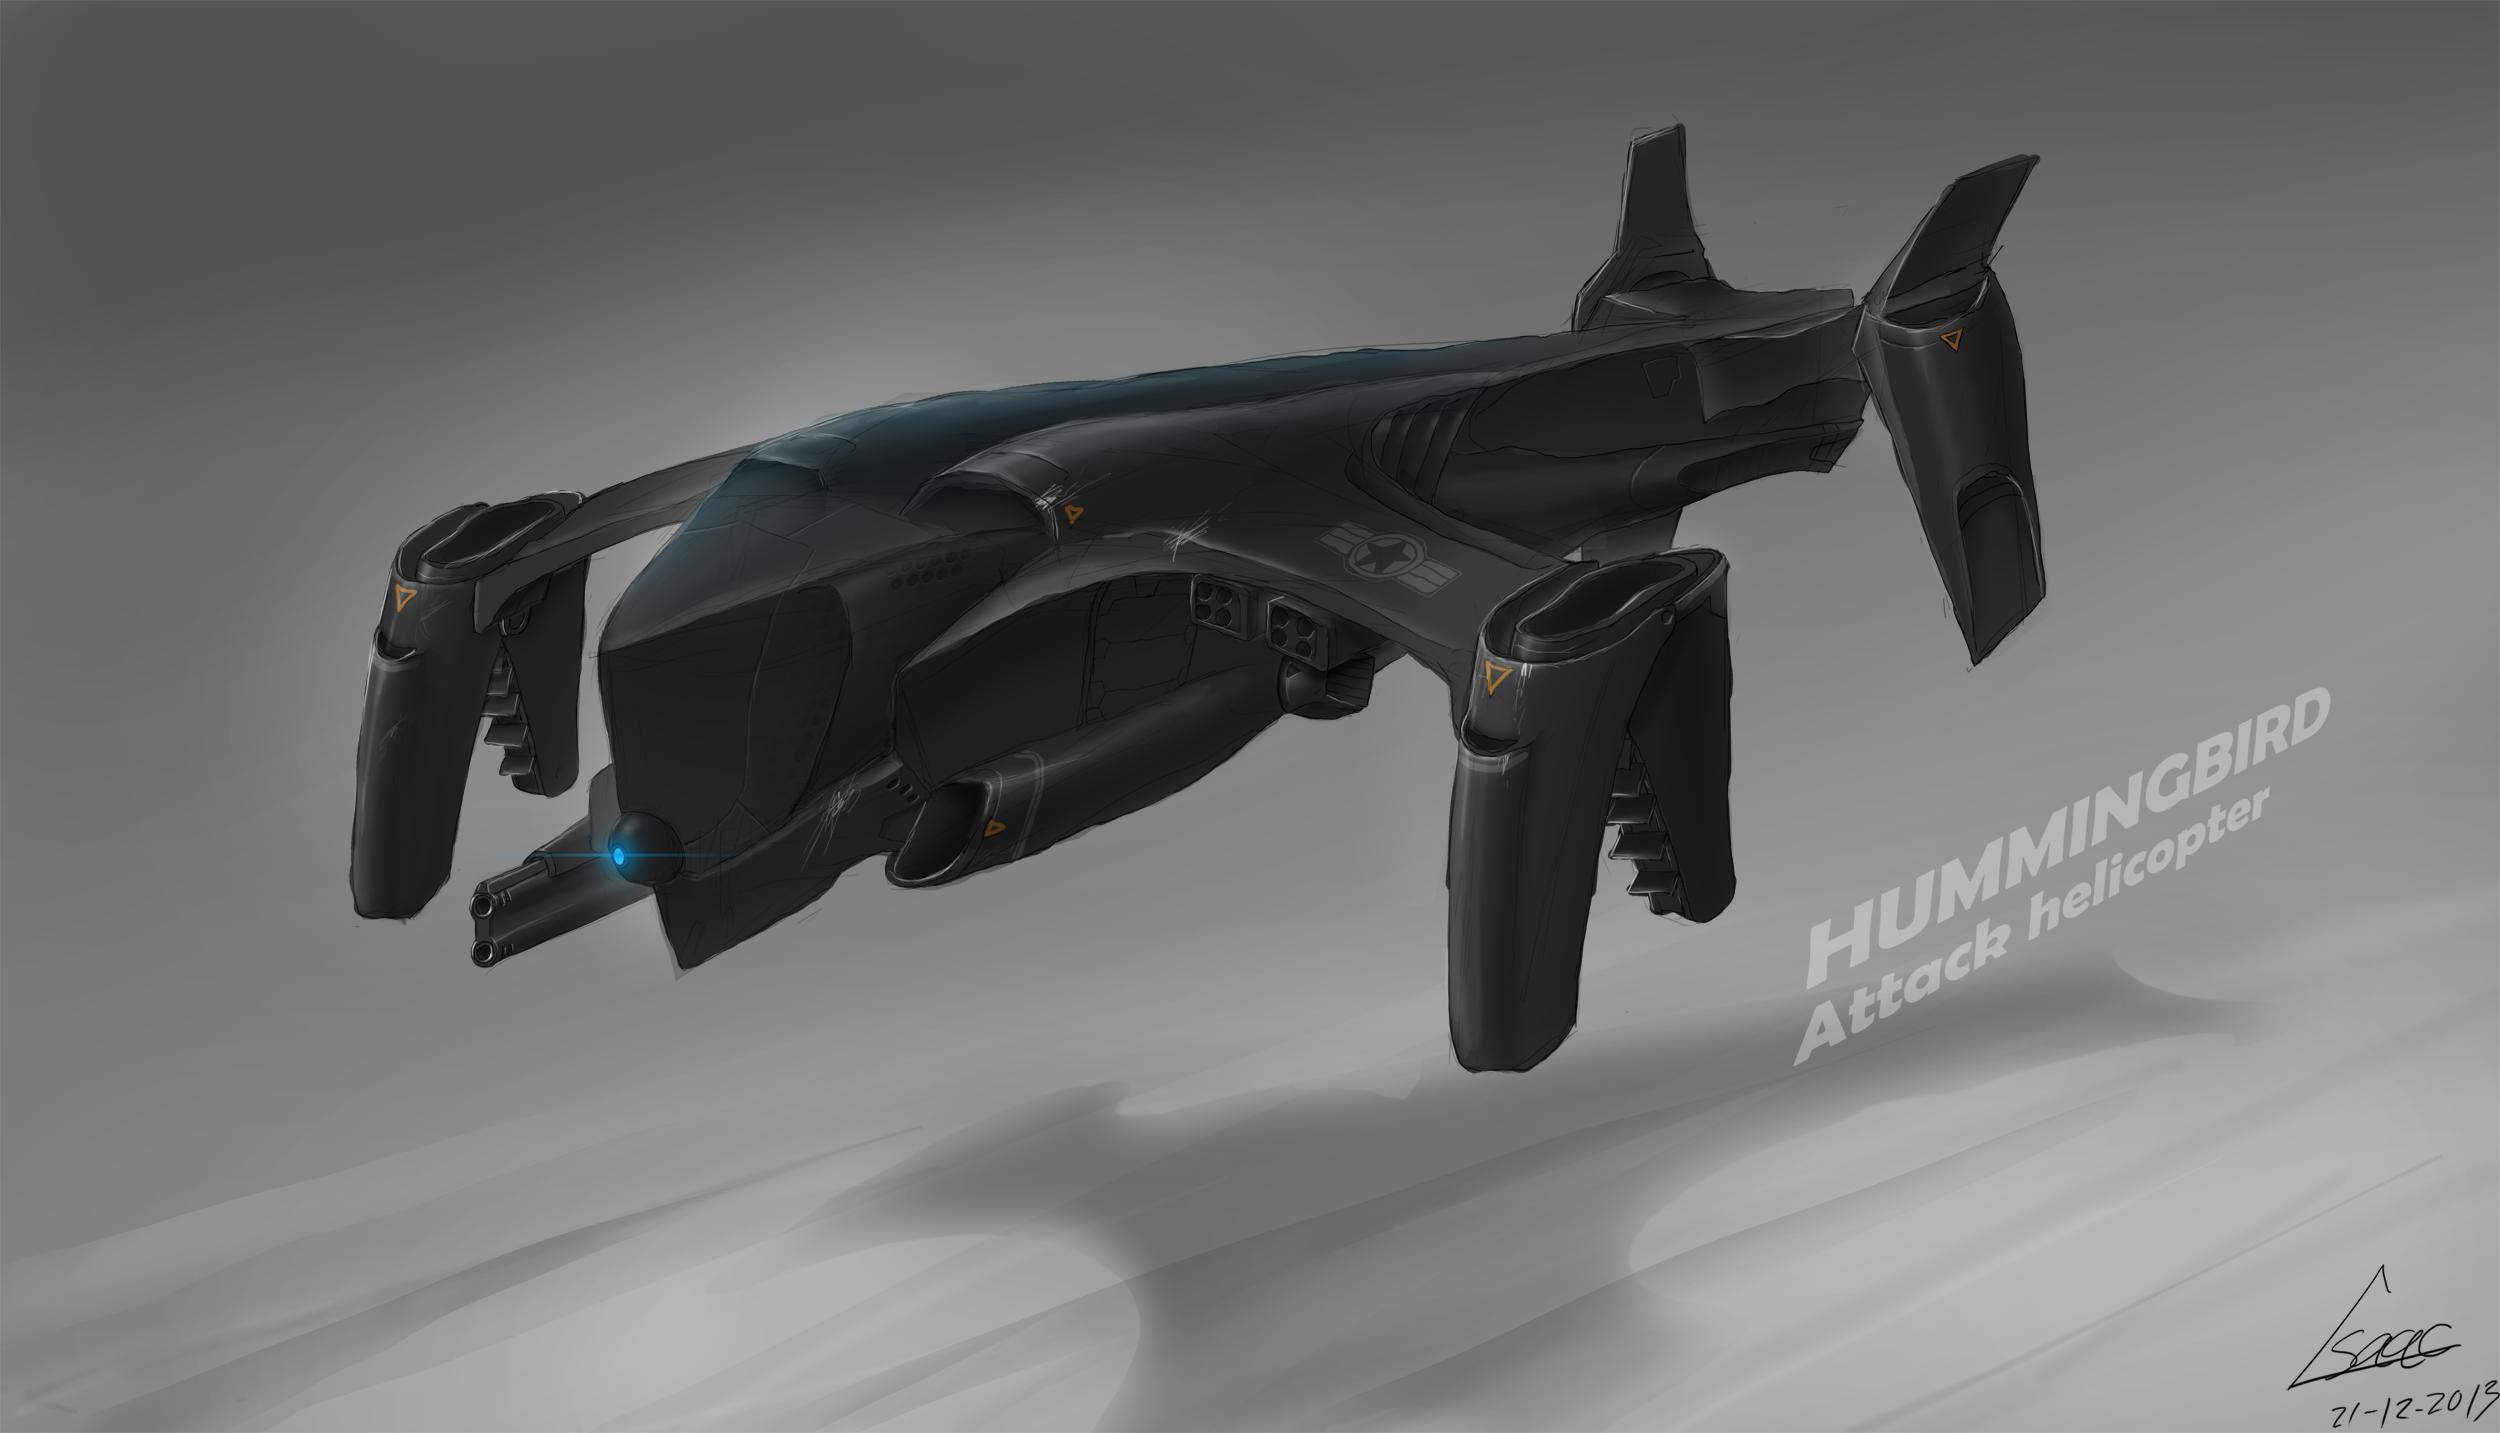 Future Concept Guns | www.imgkid.com - The Image Kid Has It!